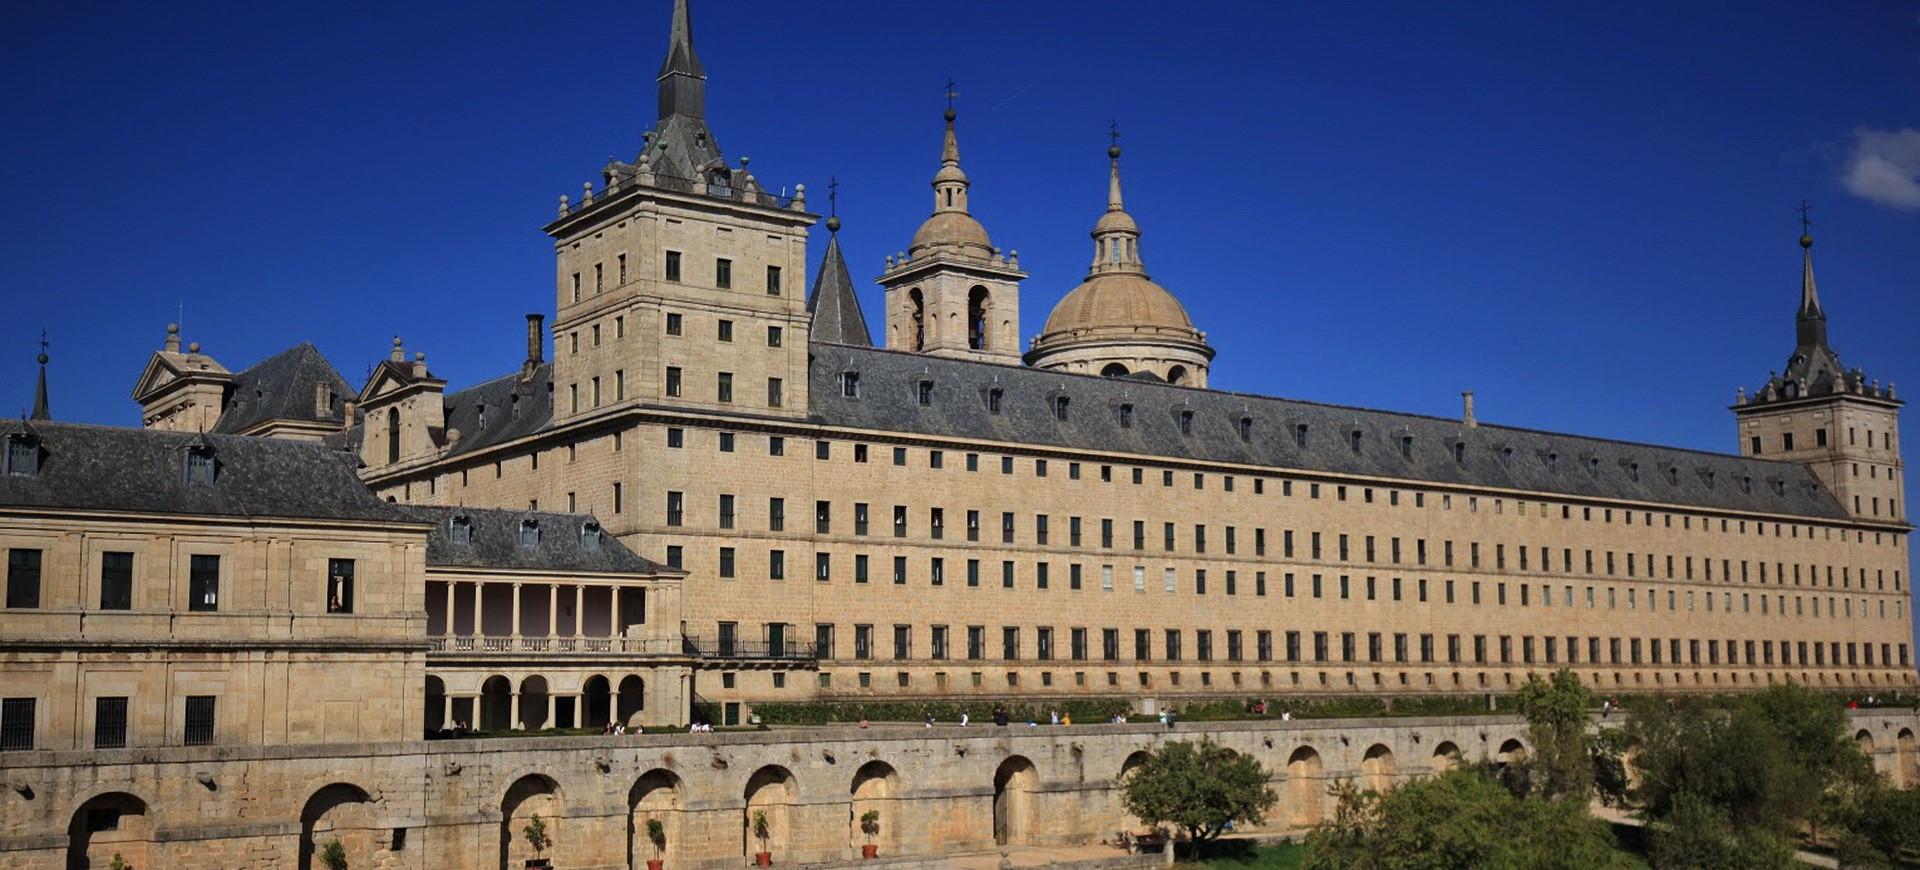 Espagne Madrid, Escorial Monastère San Lorenzo